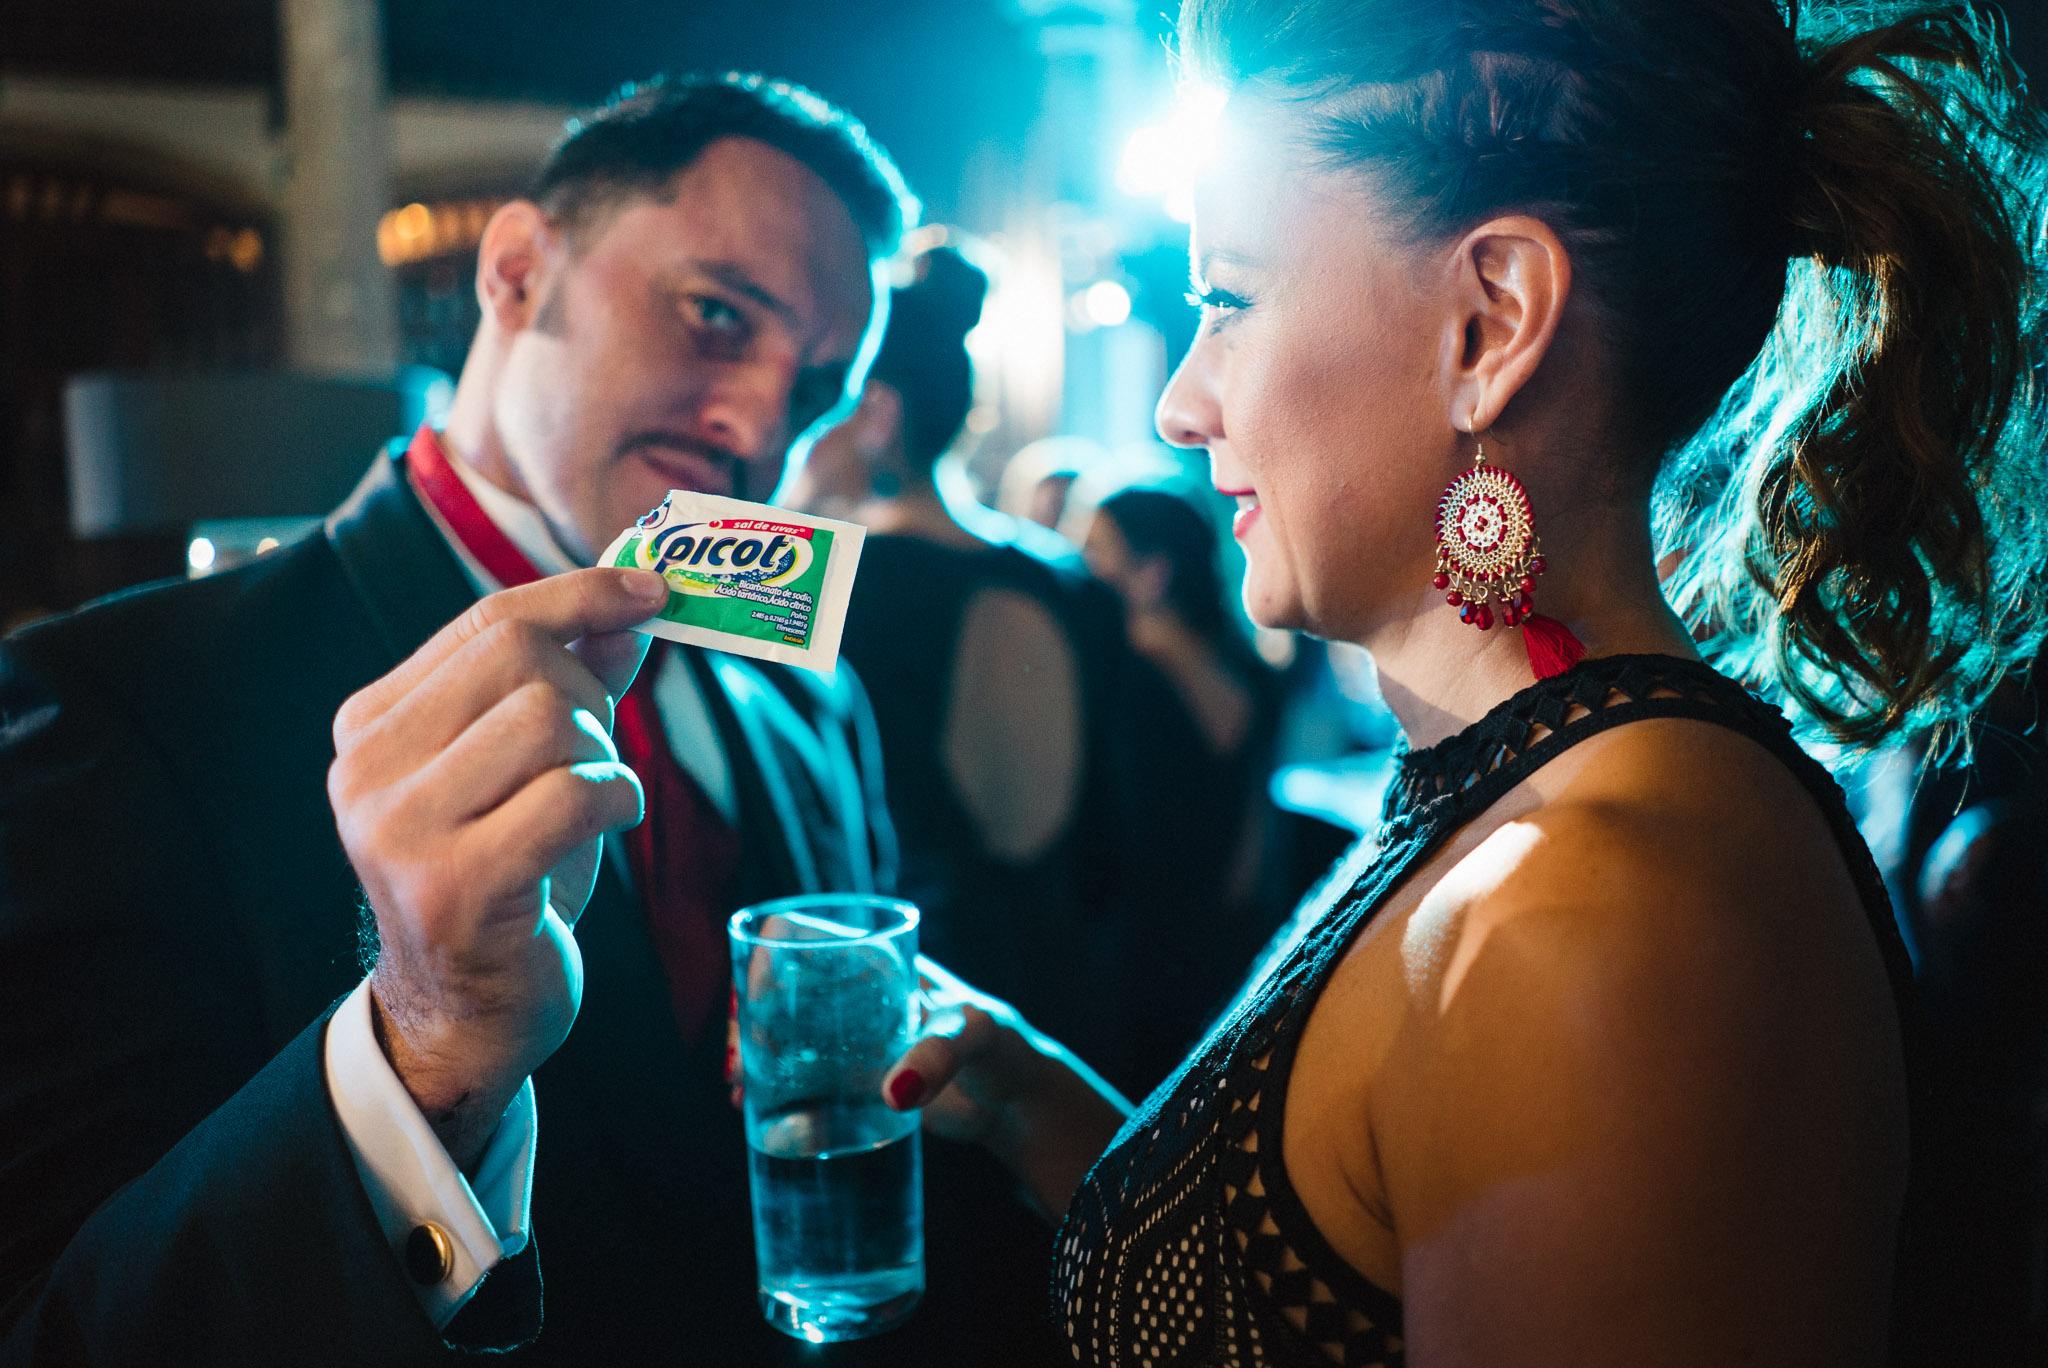 ©www.mauriziosolisbroca.com-20161002maurizio-solis-broca-mexico-canada-wedding-photographer20161002DSC08950-Edit.jpg